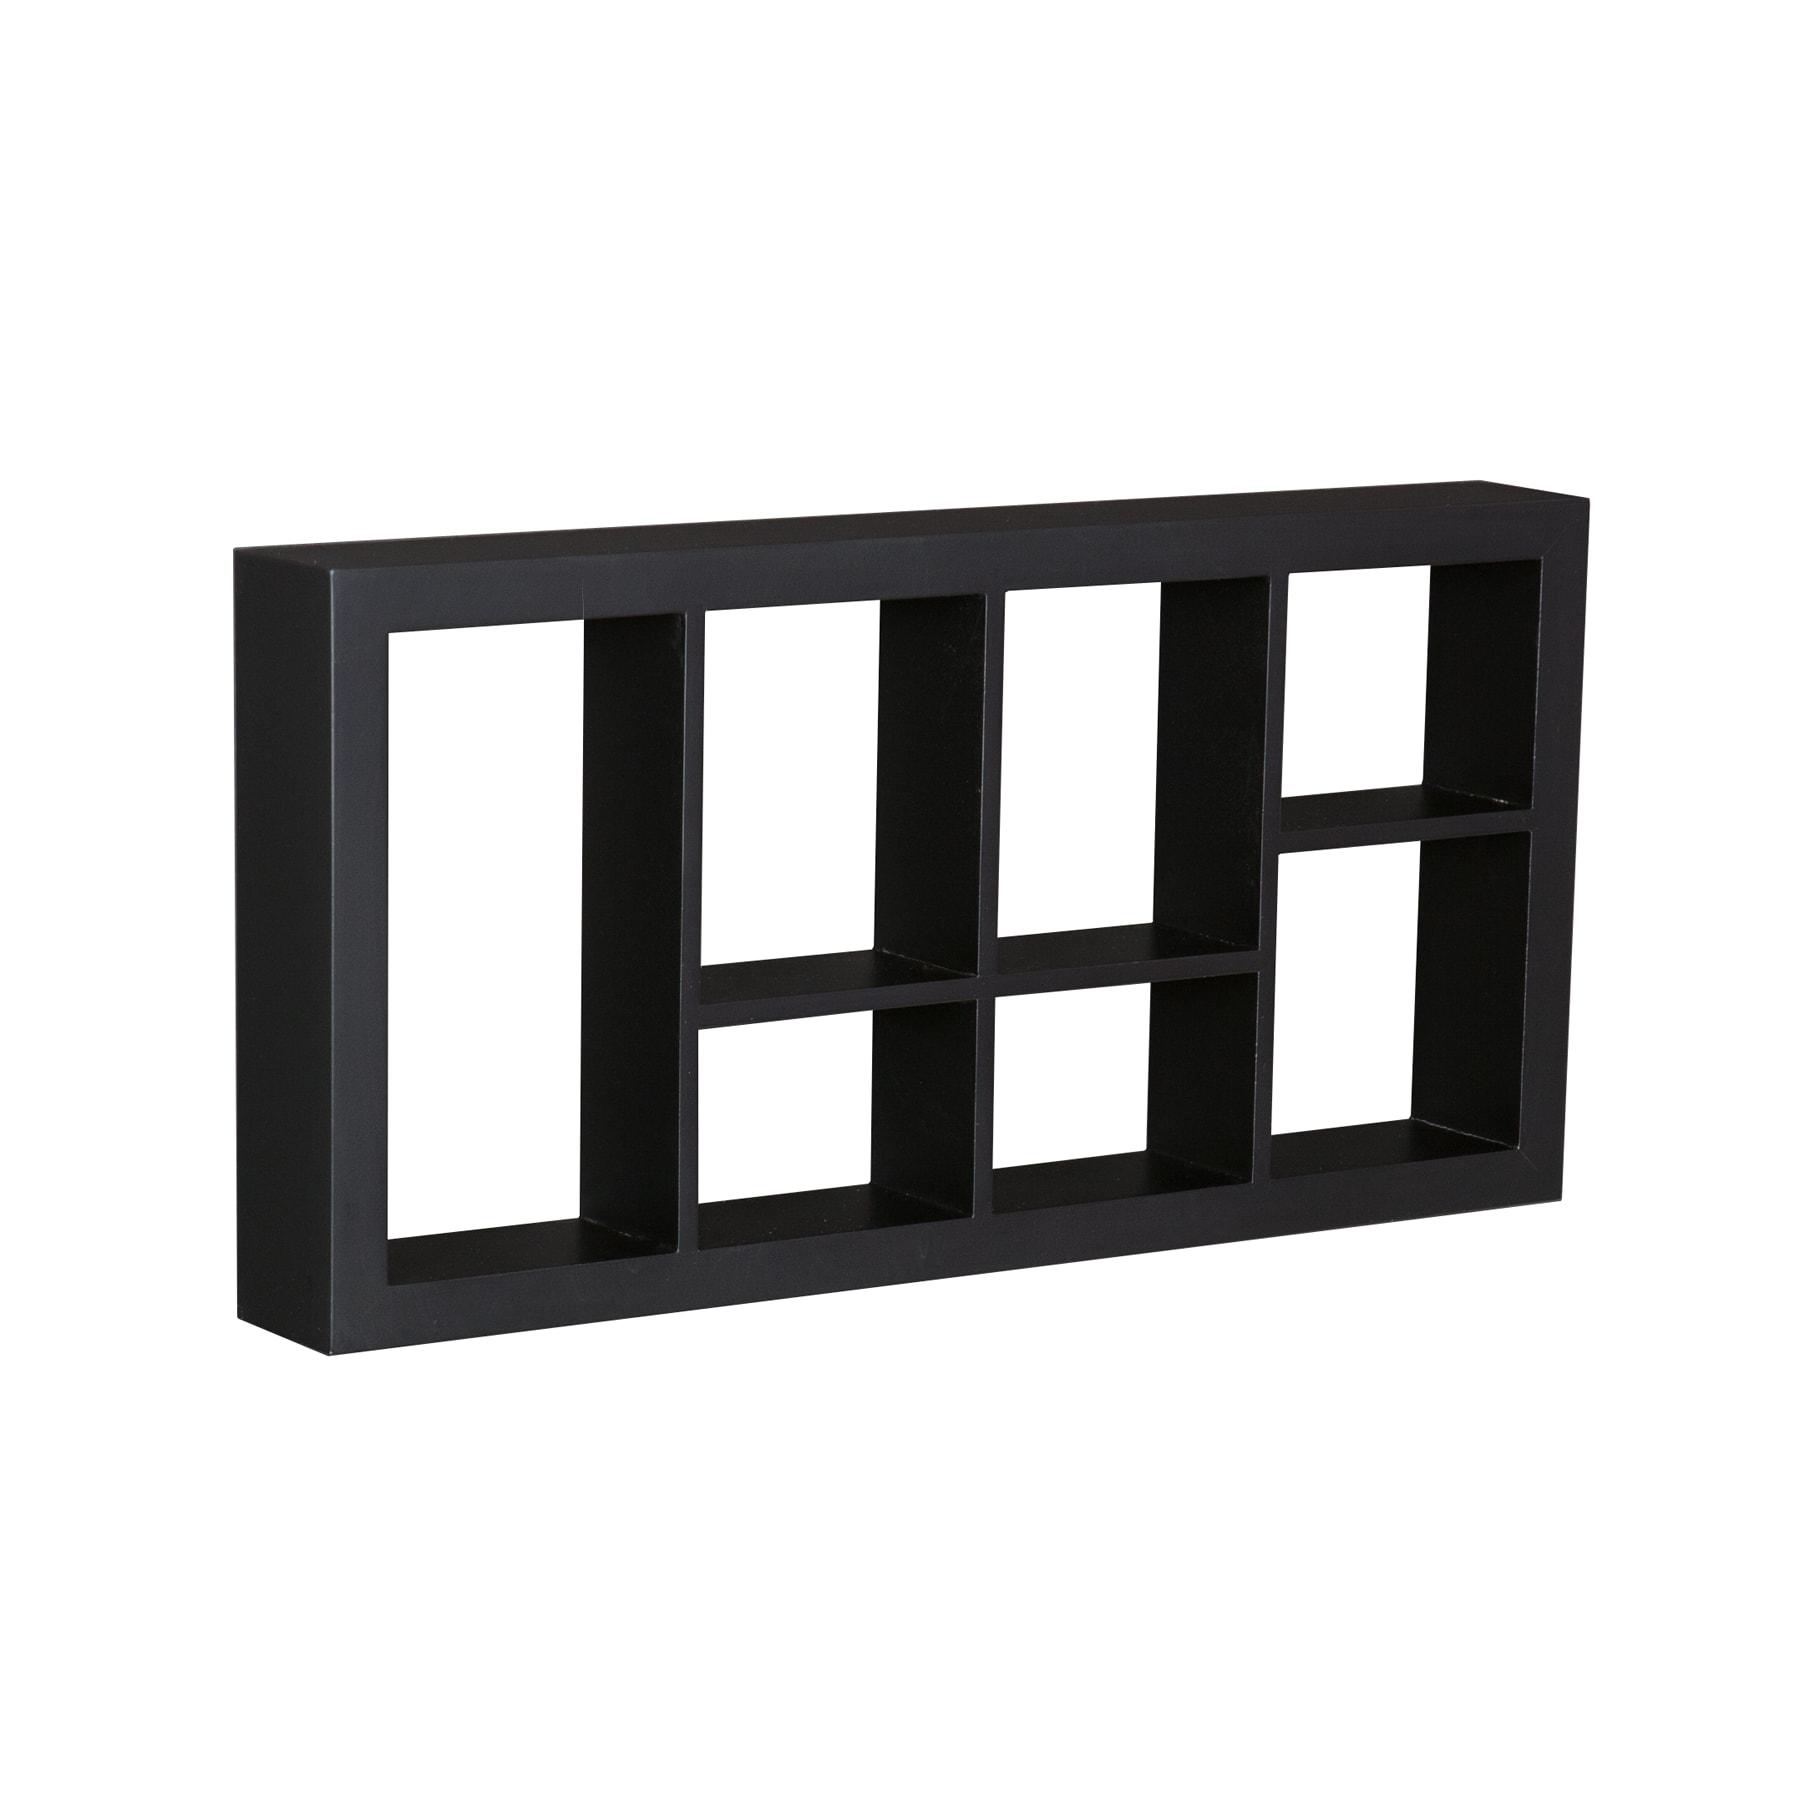 Upton Home The Felson Black 24-inch Display Shelf